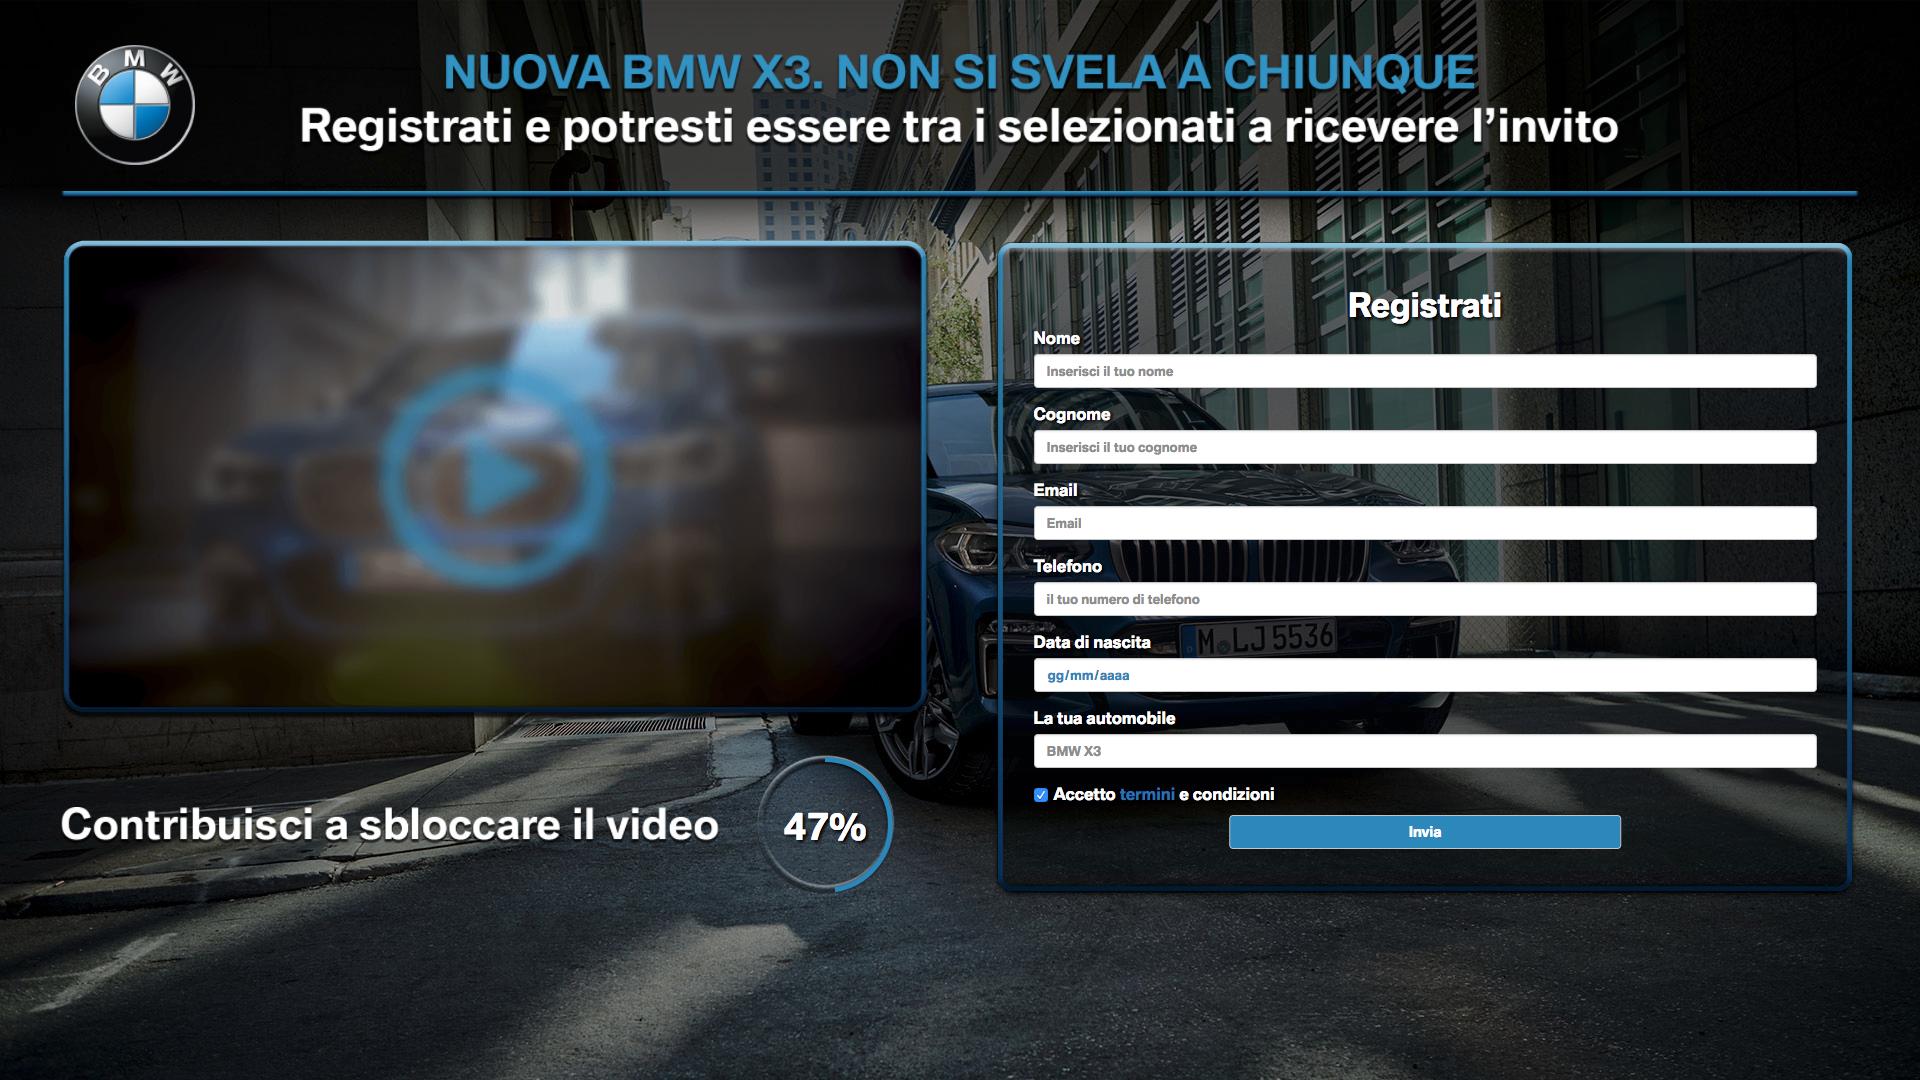 BMW Roma - Evento di lancio Nuova BMW X3